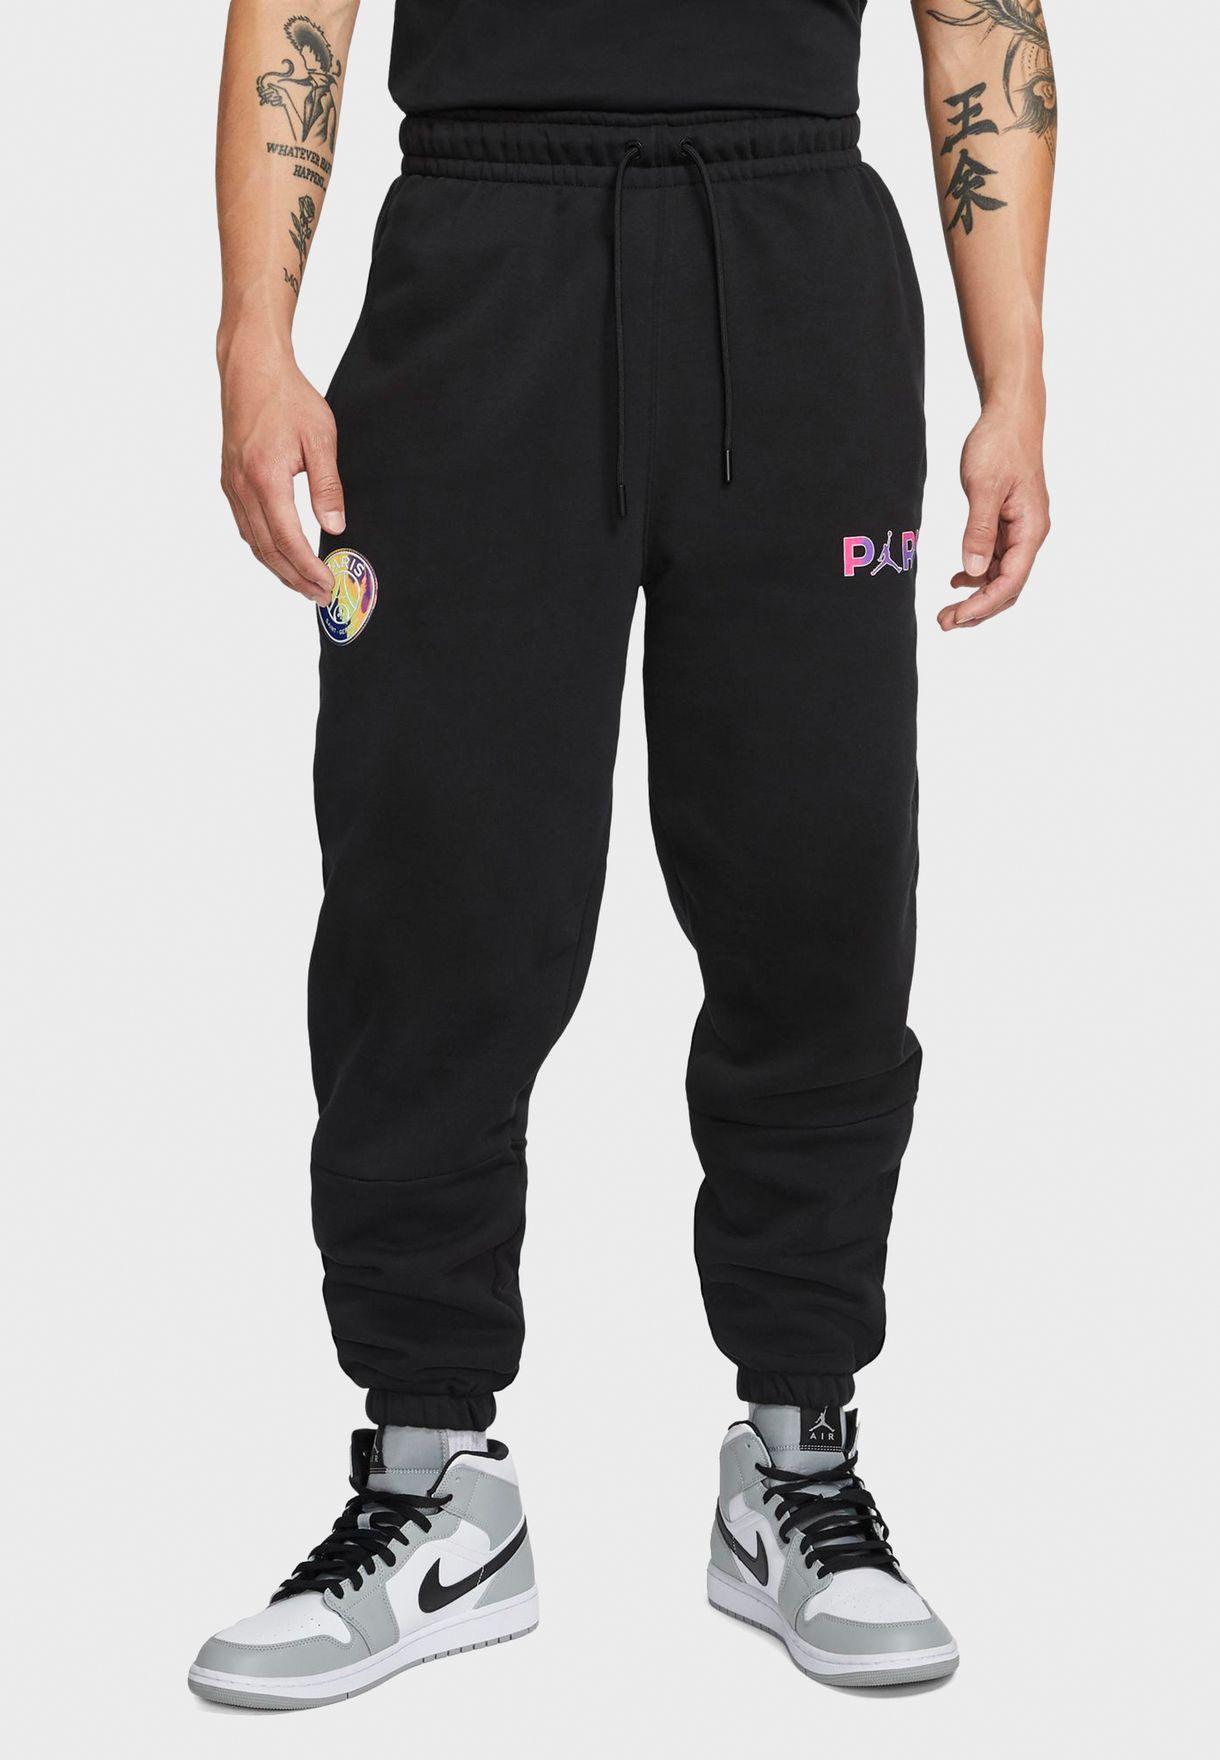 Jordan PSG Fleece Sweatpants